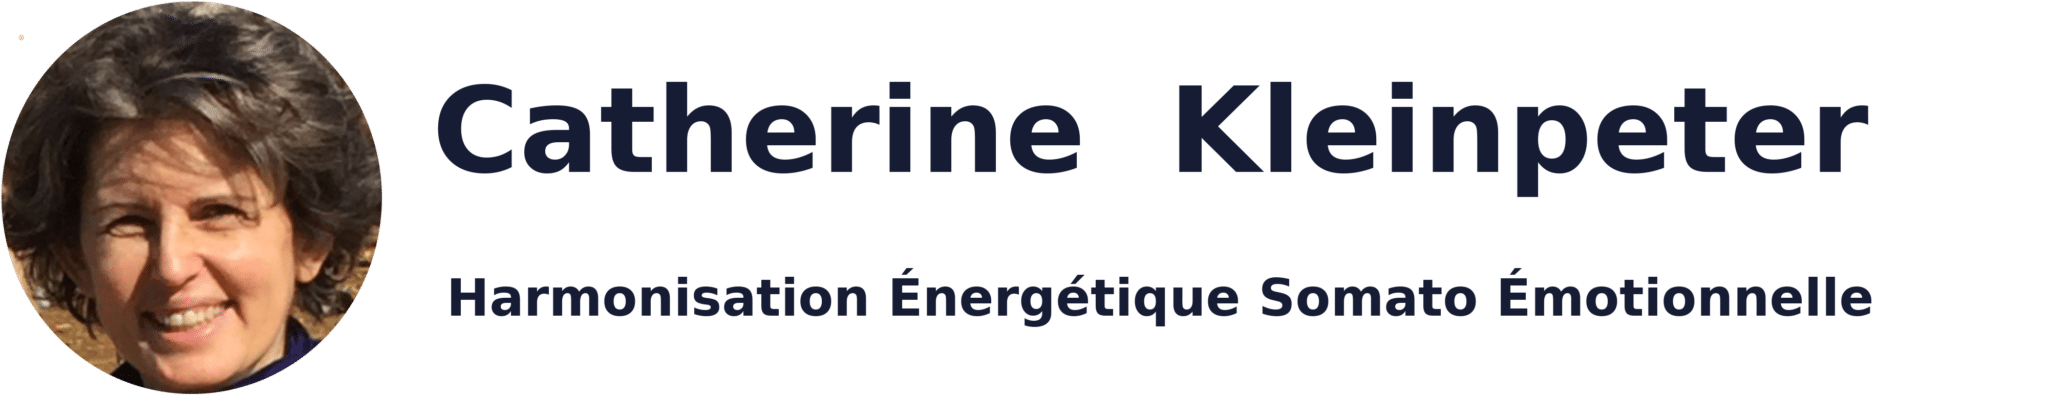 Catherine Kleinpeter